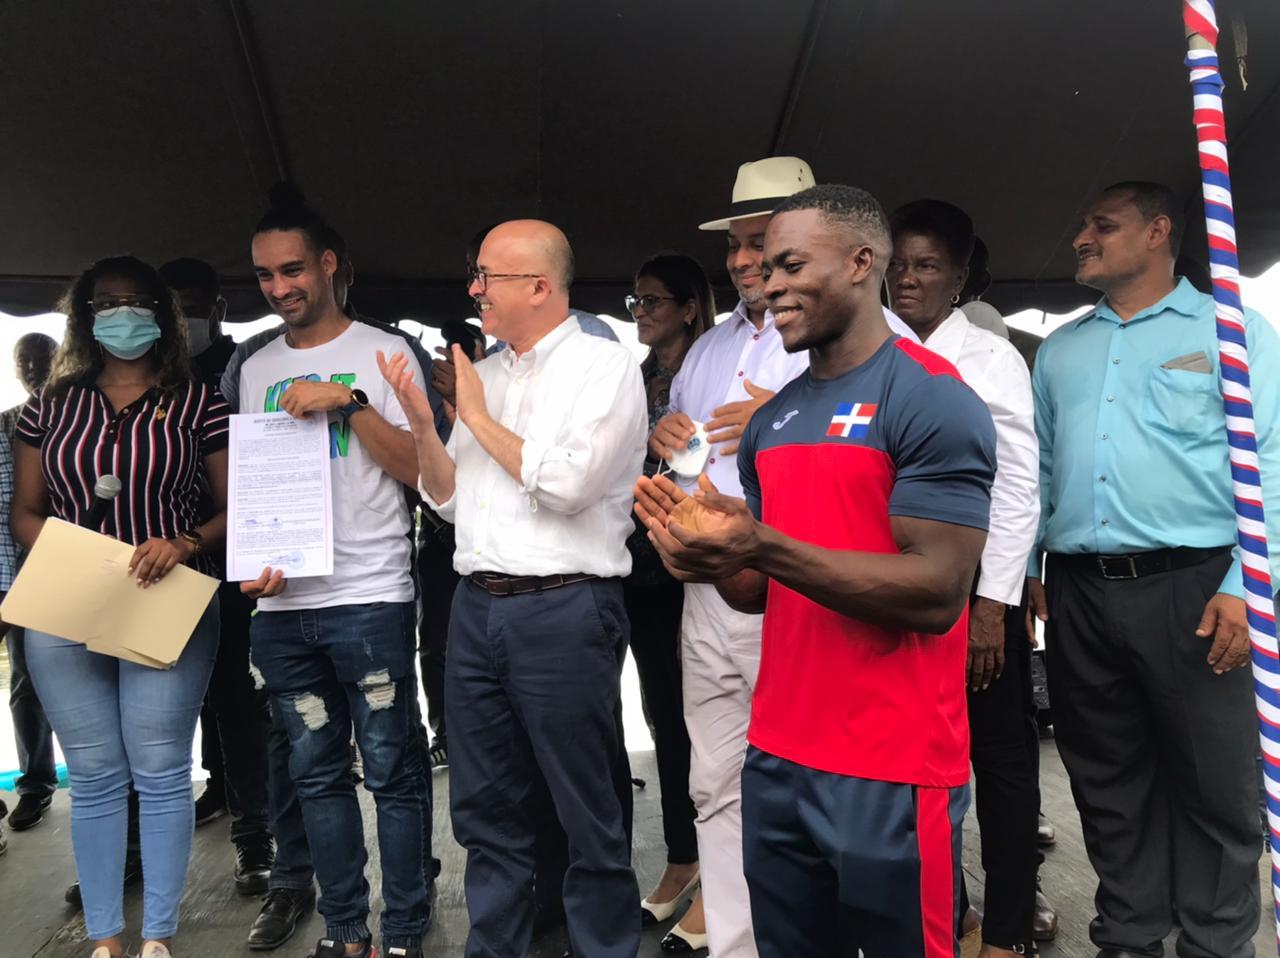 Alcalde de Bayaguana premia atletas que ganaron medallas en Juegos Olímpicos Tokio-2020